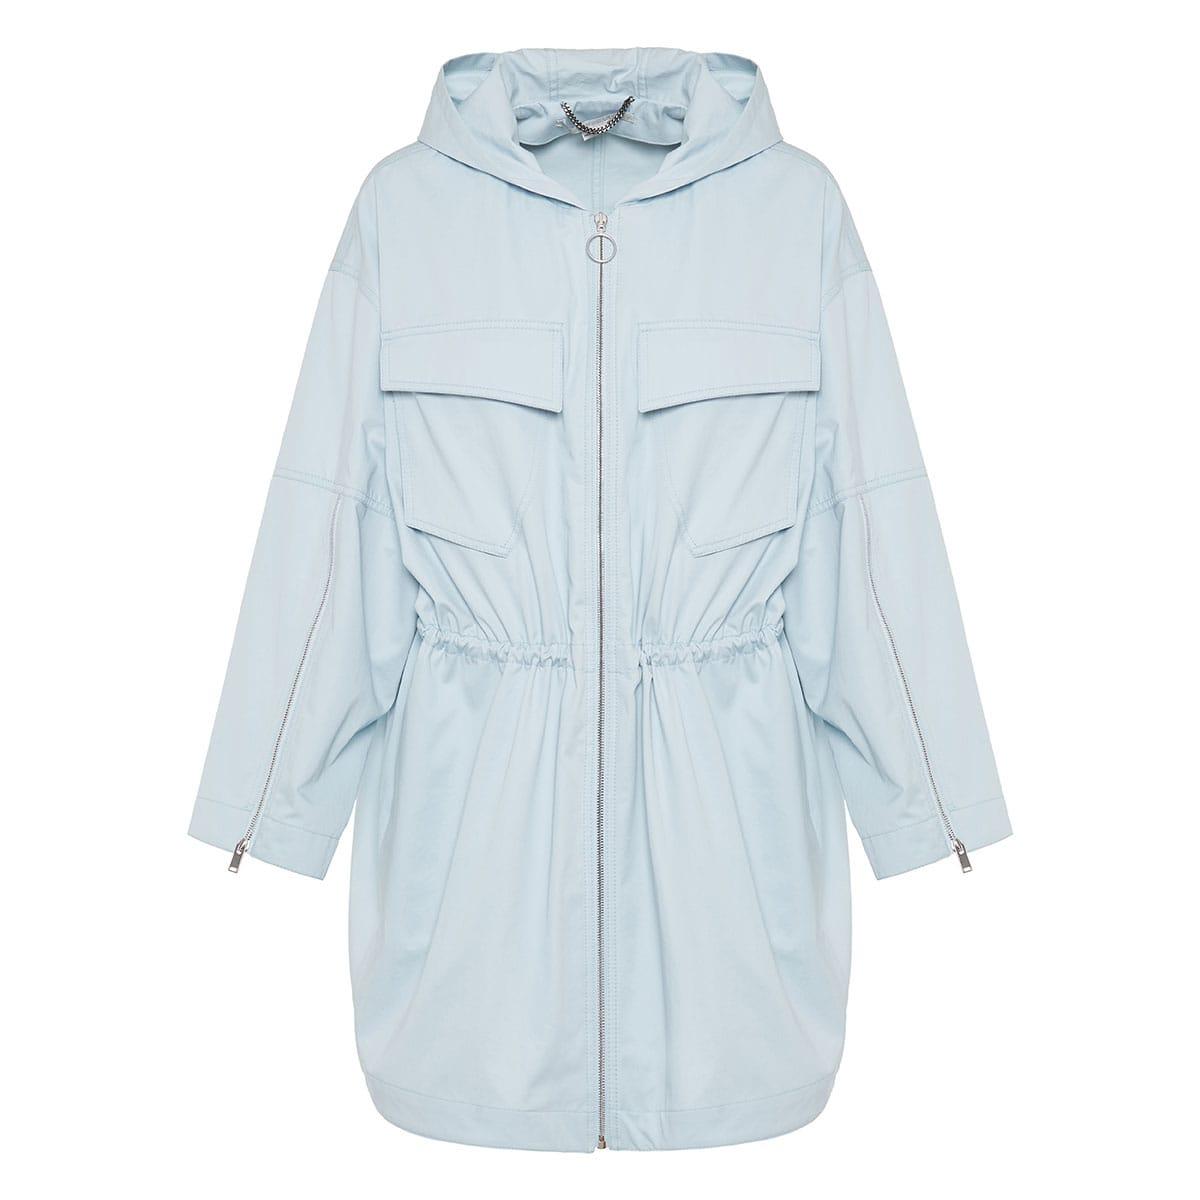 Hooded cotton parka jacket